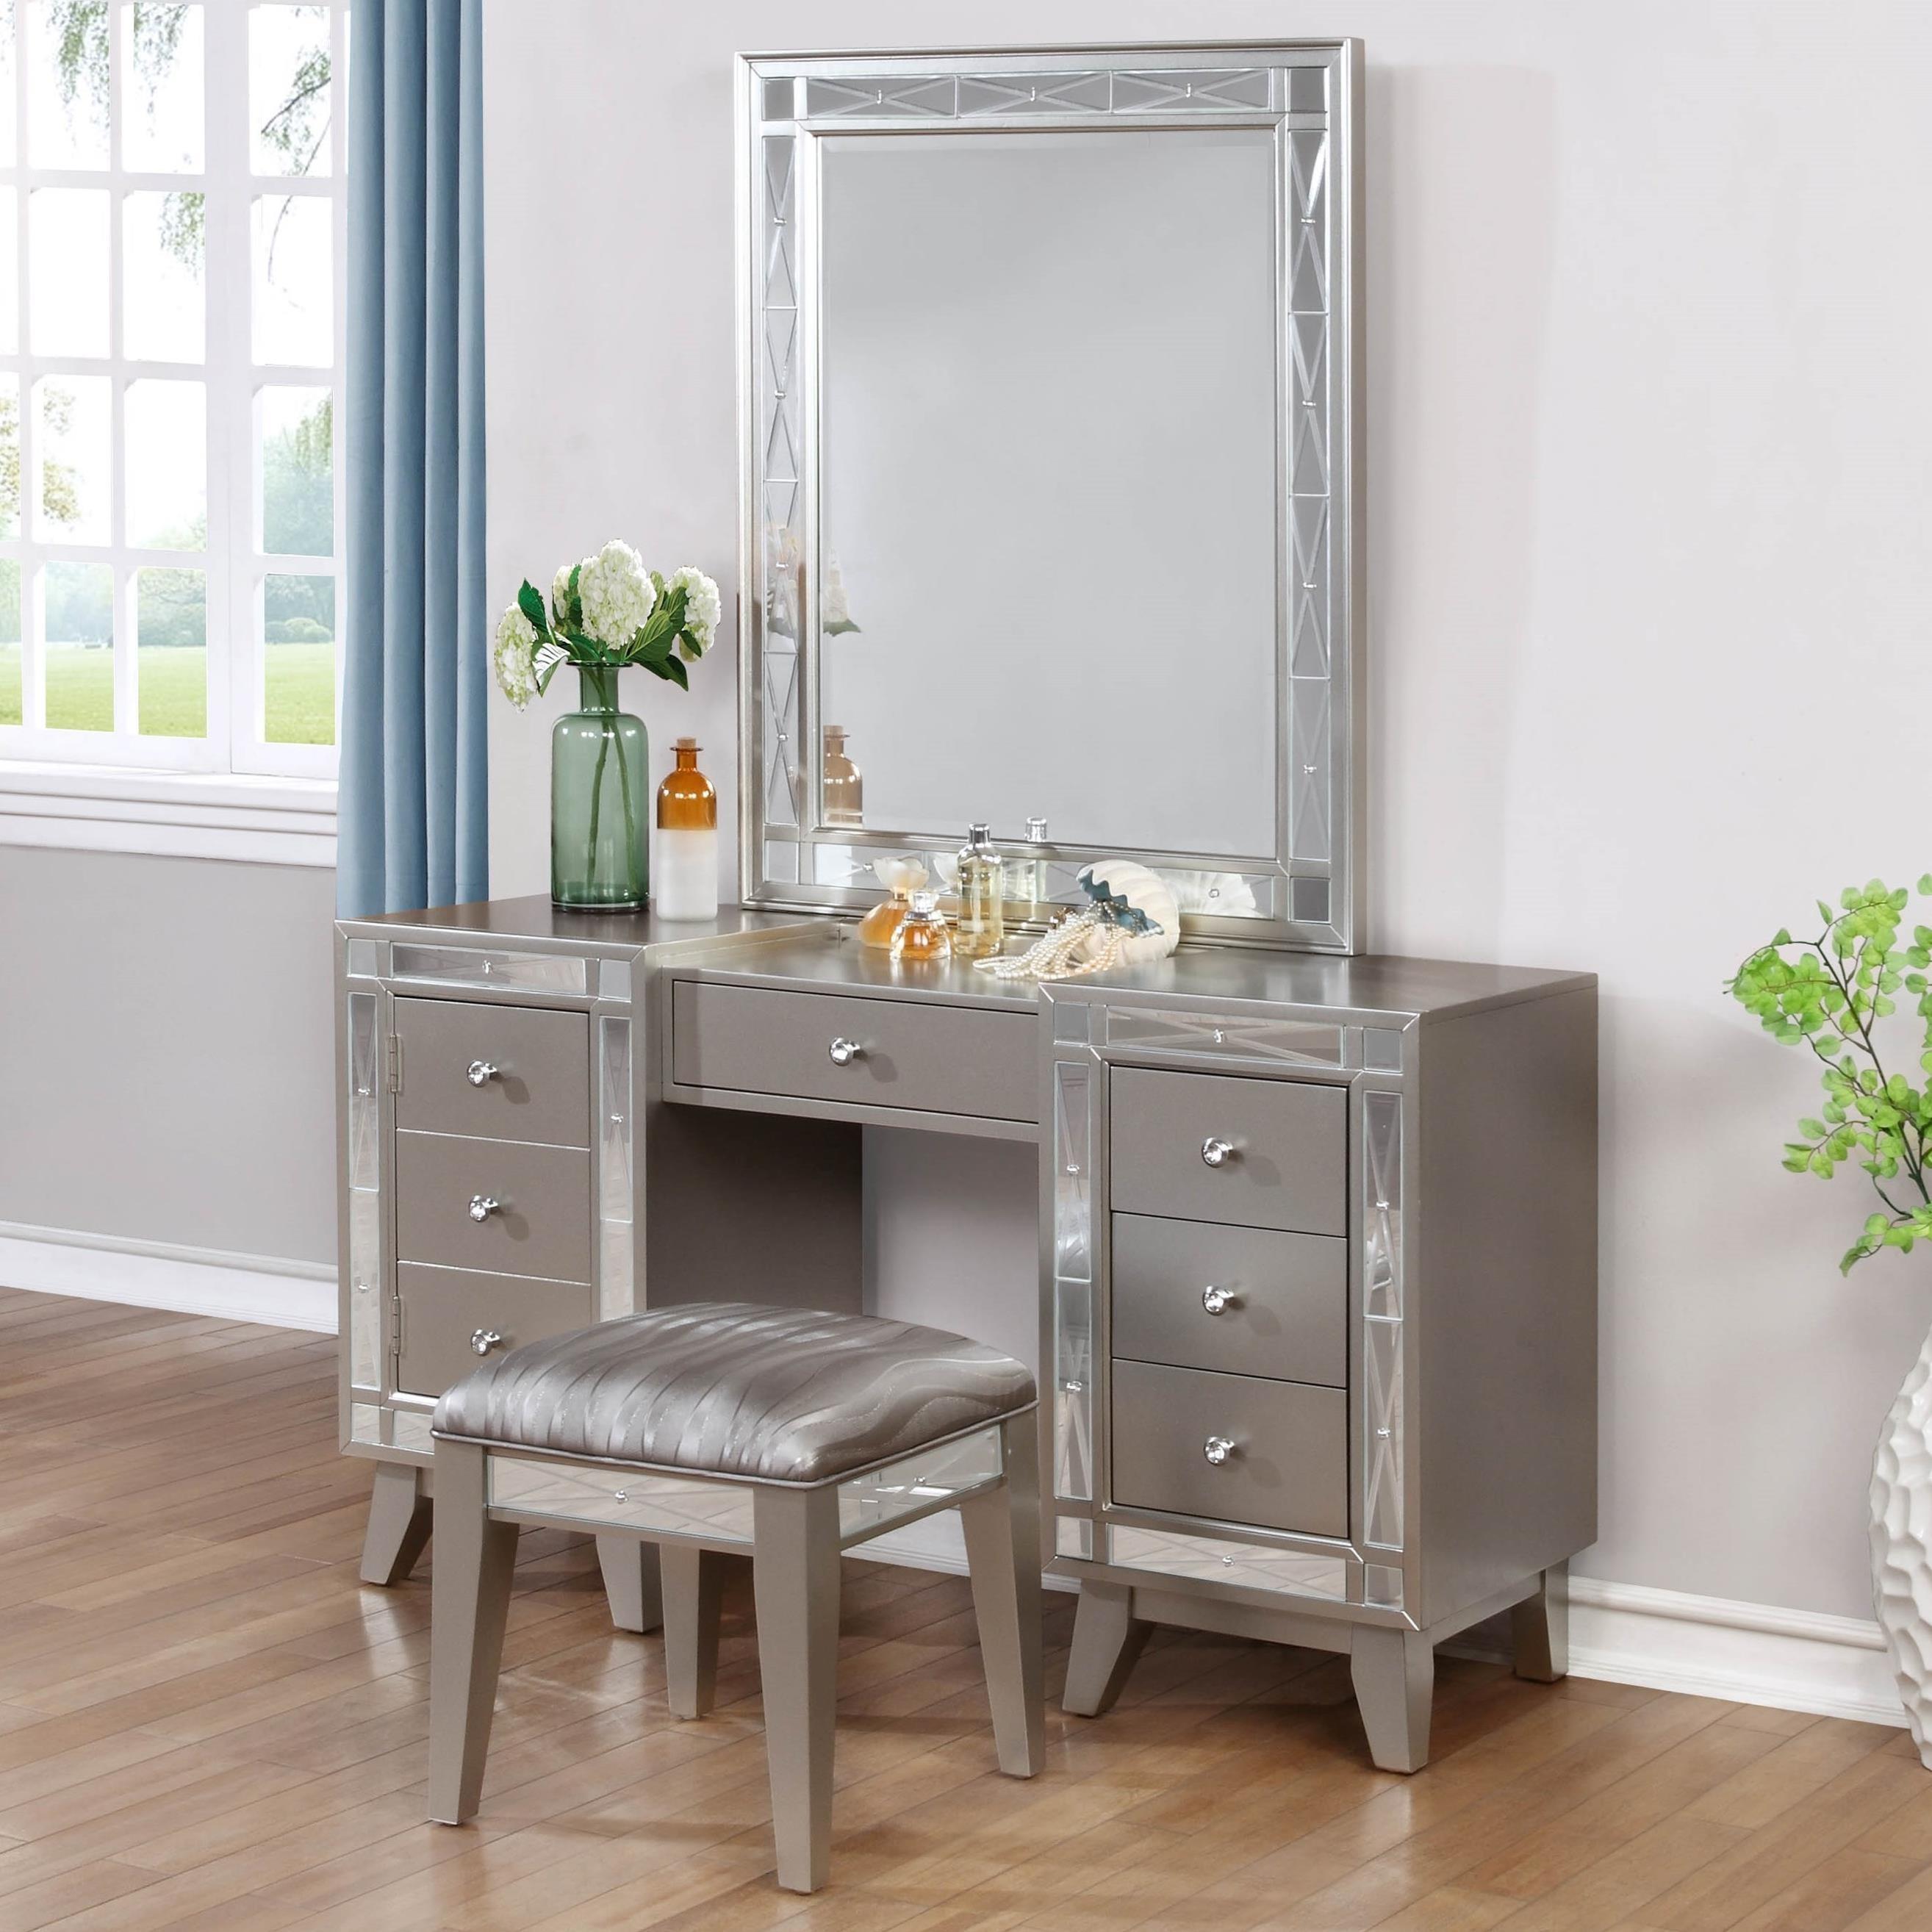 leighton vanity desk stool and mirror combo